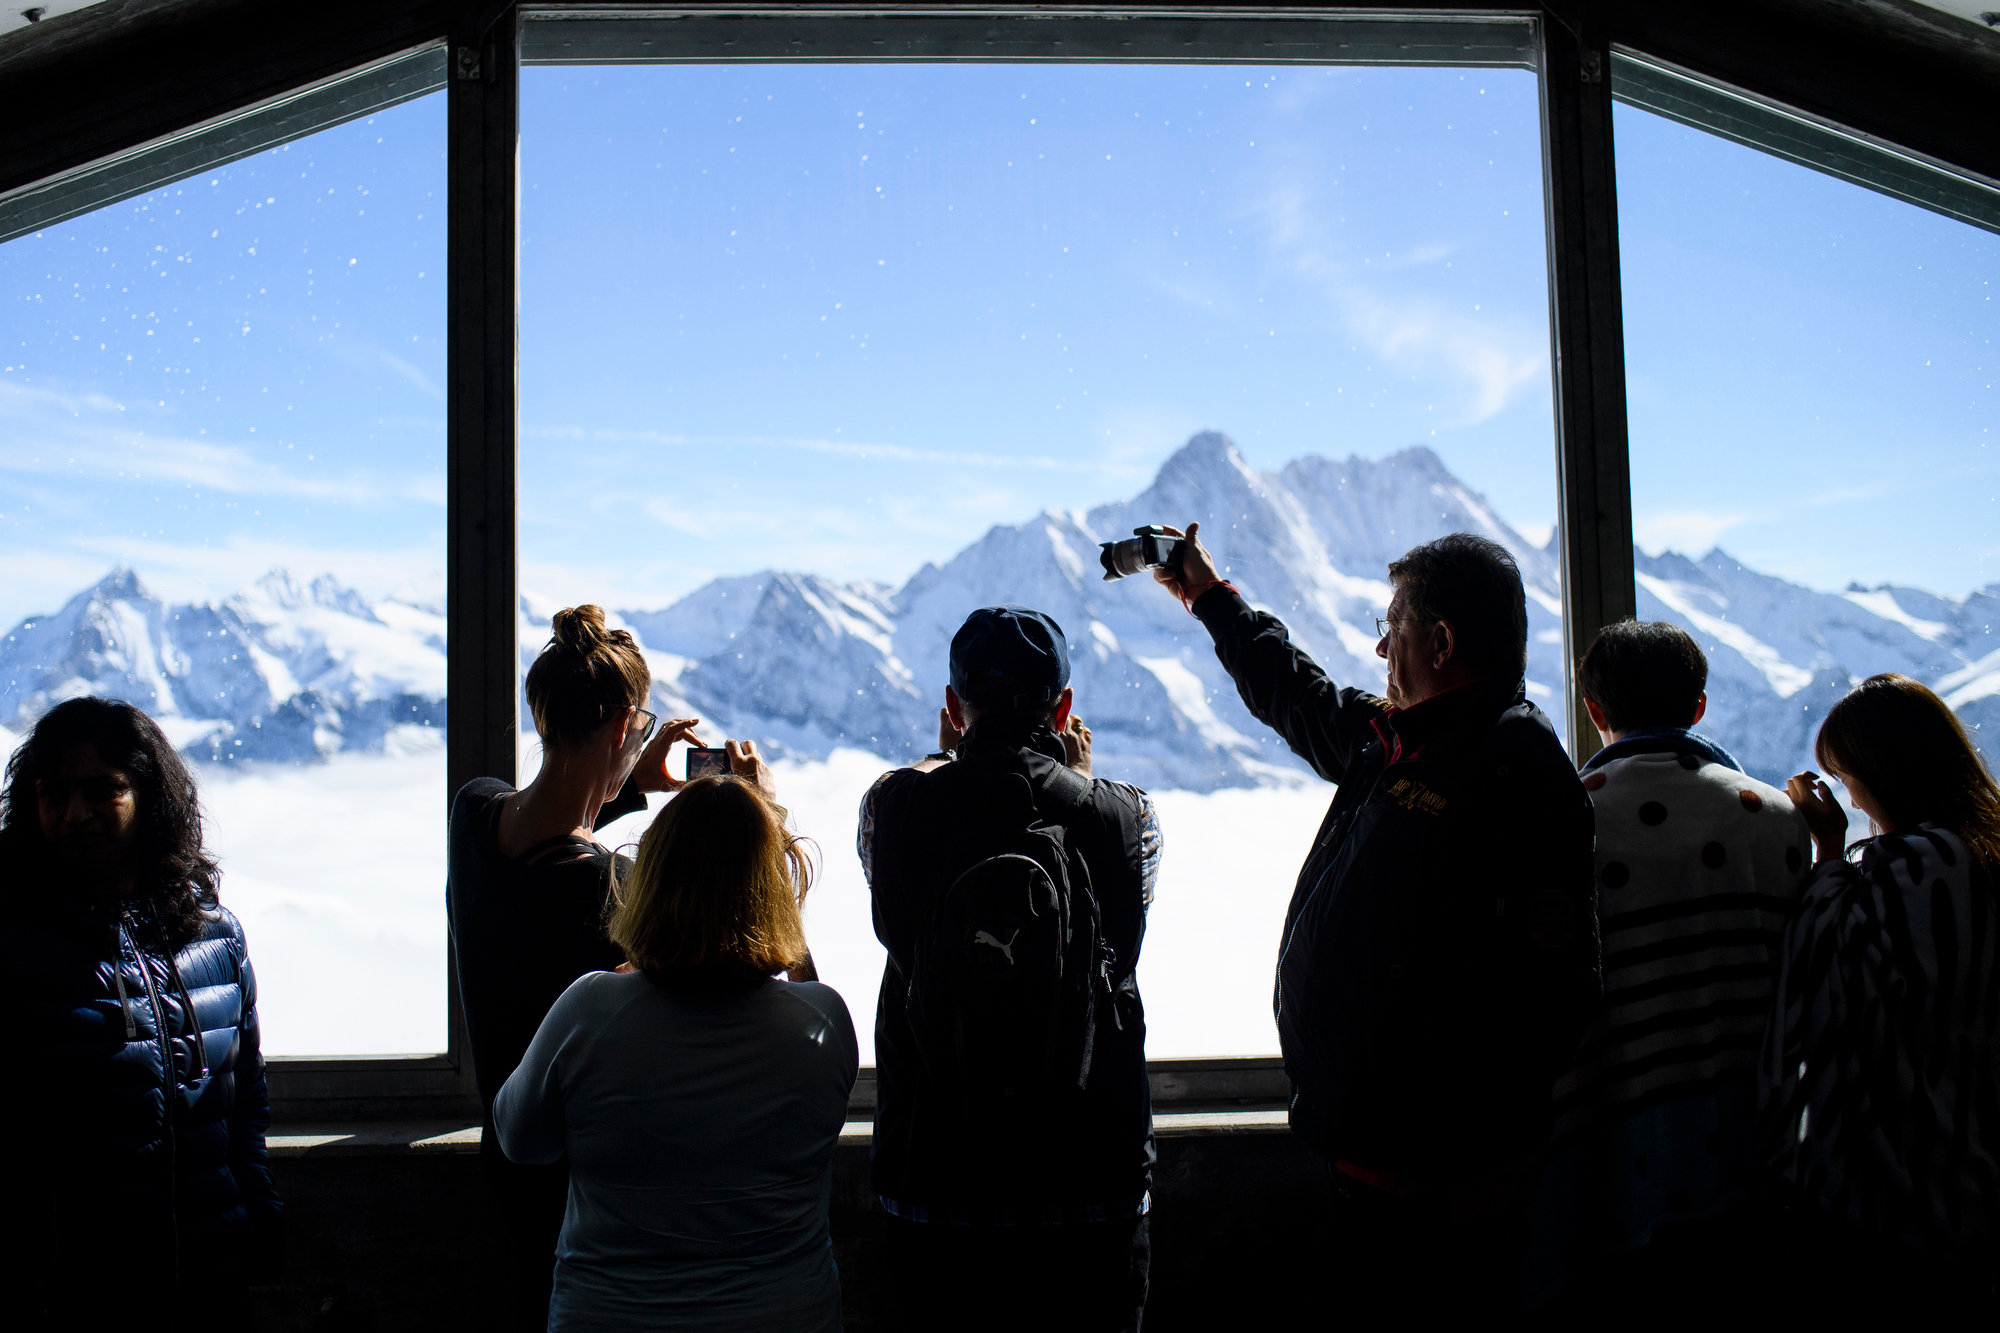 SWITZERLAND JUNGFRAUJOCH TOURISTS